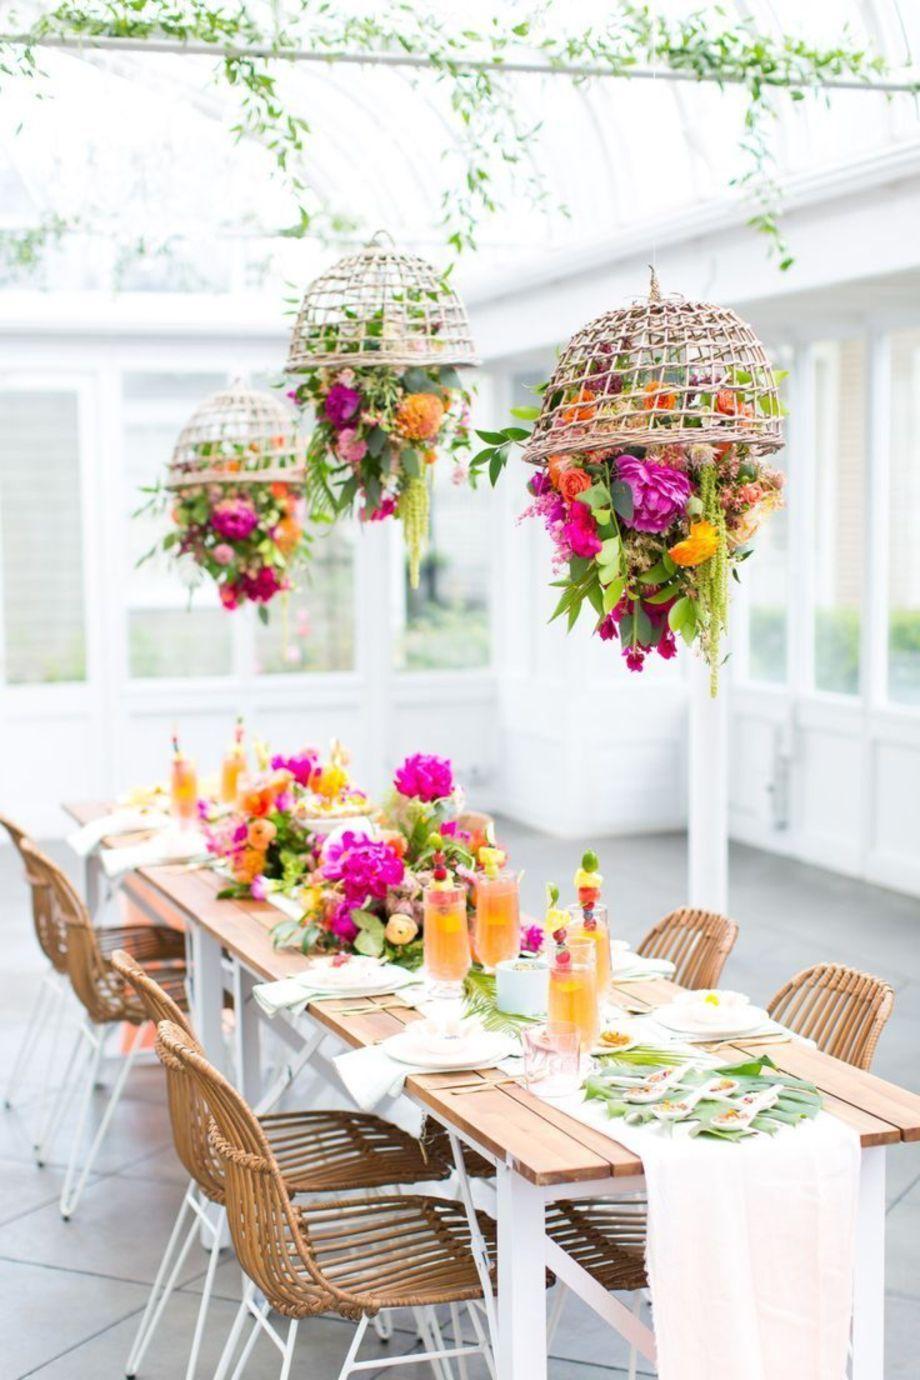 54 Brilliant Garden Theme Bridal Shower Ideas | Garden theme